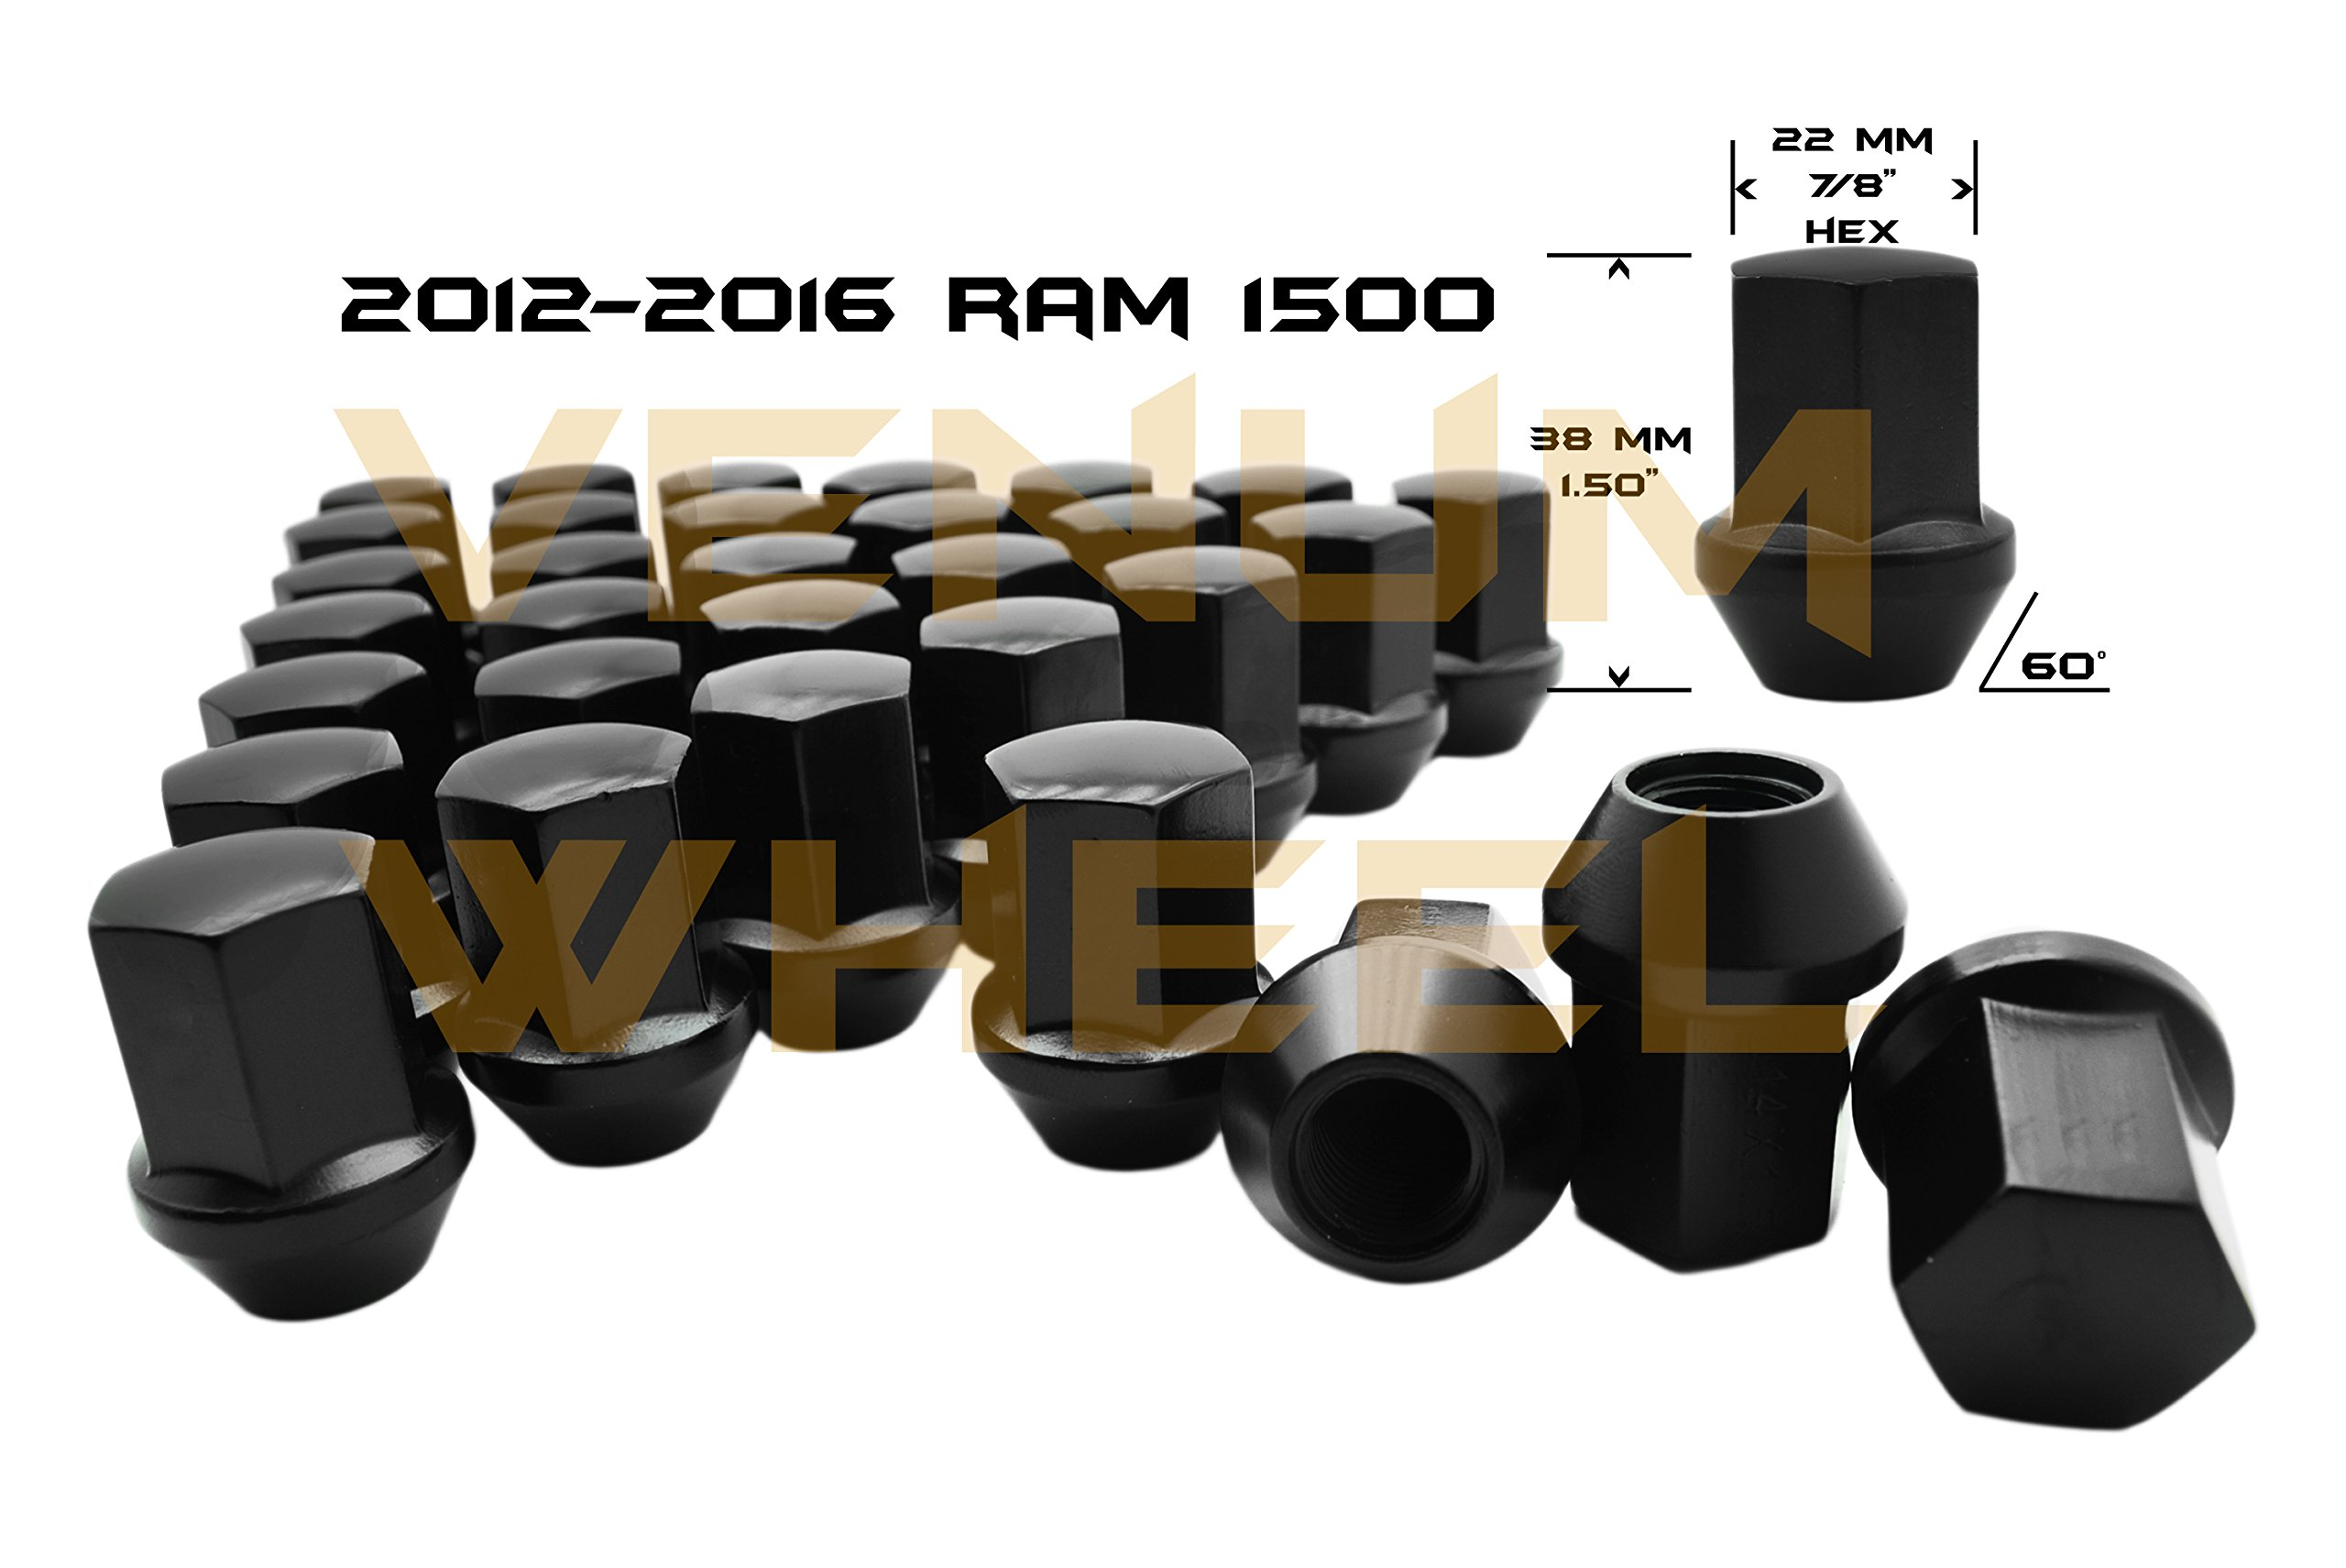 Venum wheel accessories 2012-2019 Ram 1500 Black OEM Factory Style Black Lug Nuts M14x1.5 W/ 22MM Hex Close End 1.5'' Tall 5x5.5 New Model Ram 1500 Made in USA